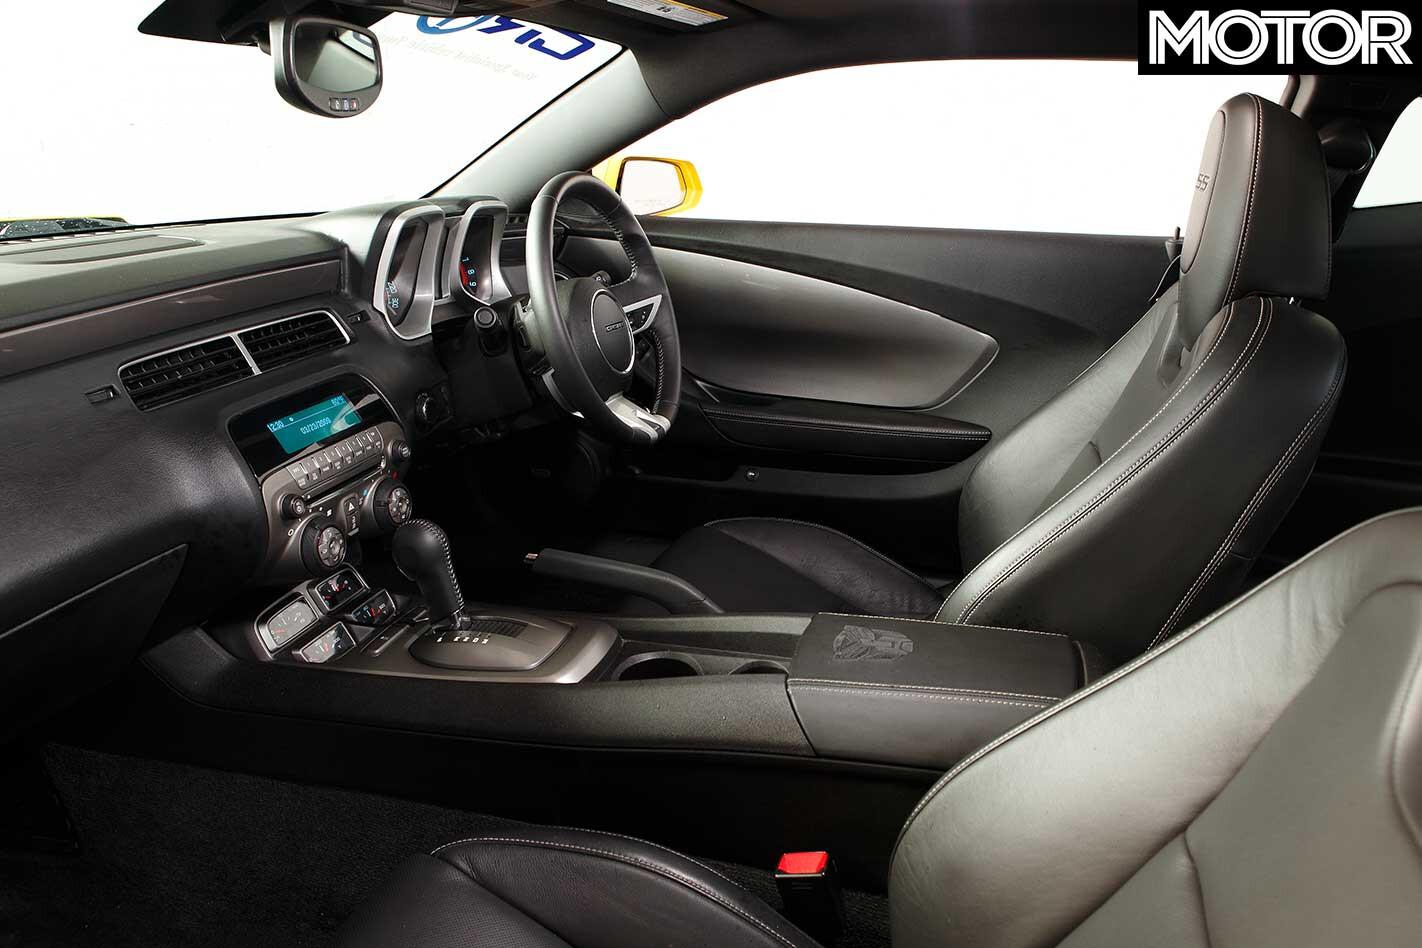 2011 Chevrolet Camaro Interior Jpg